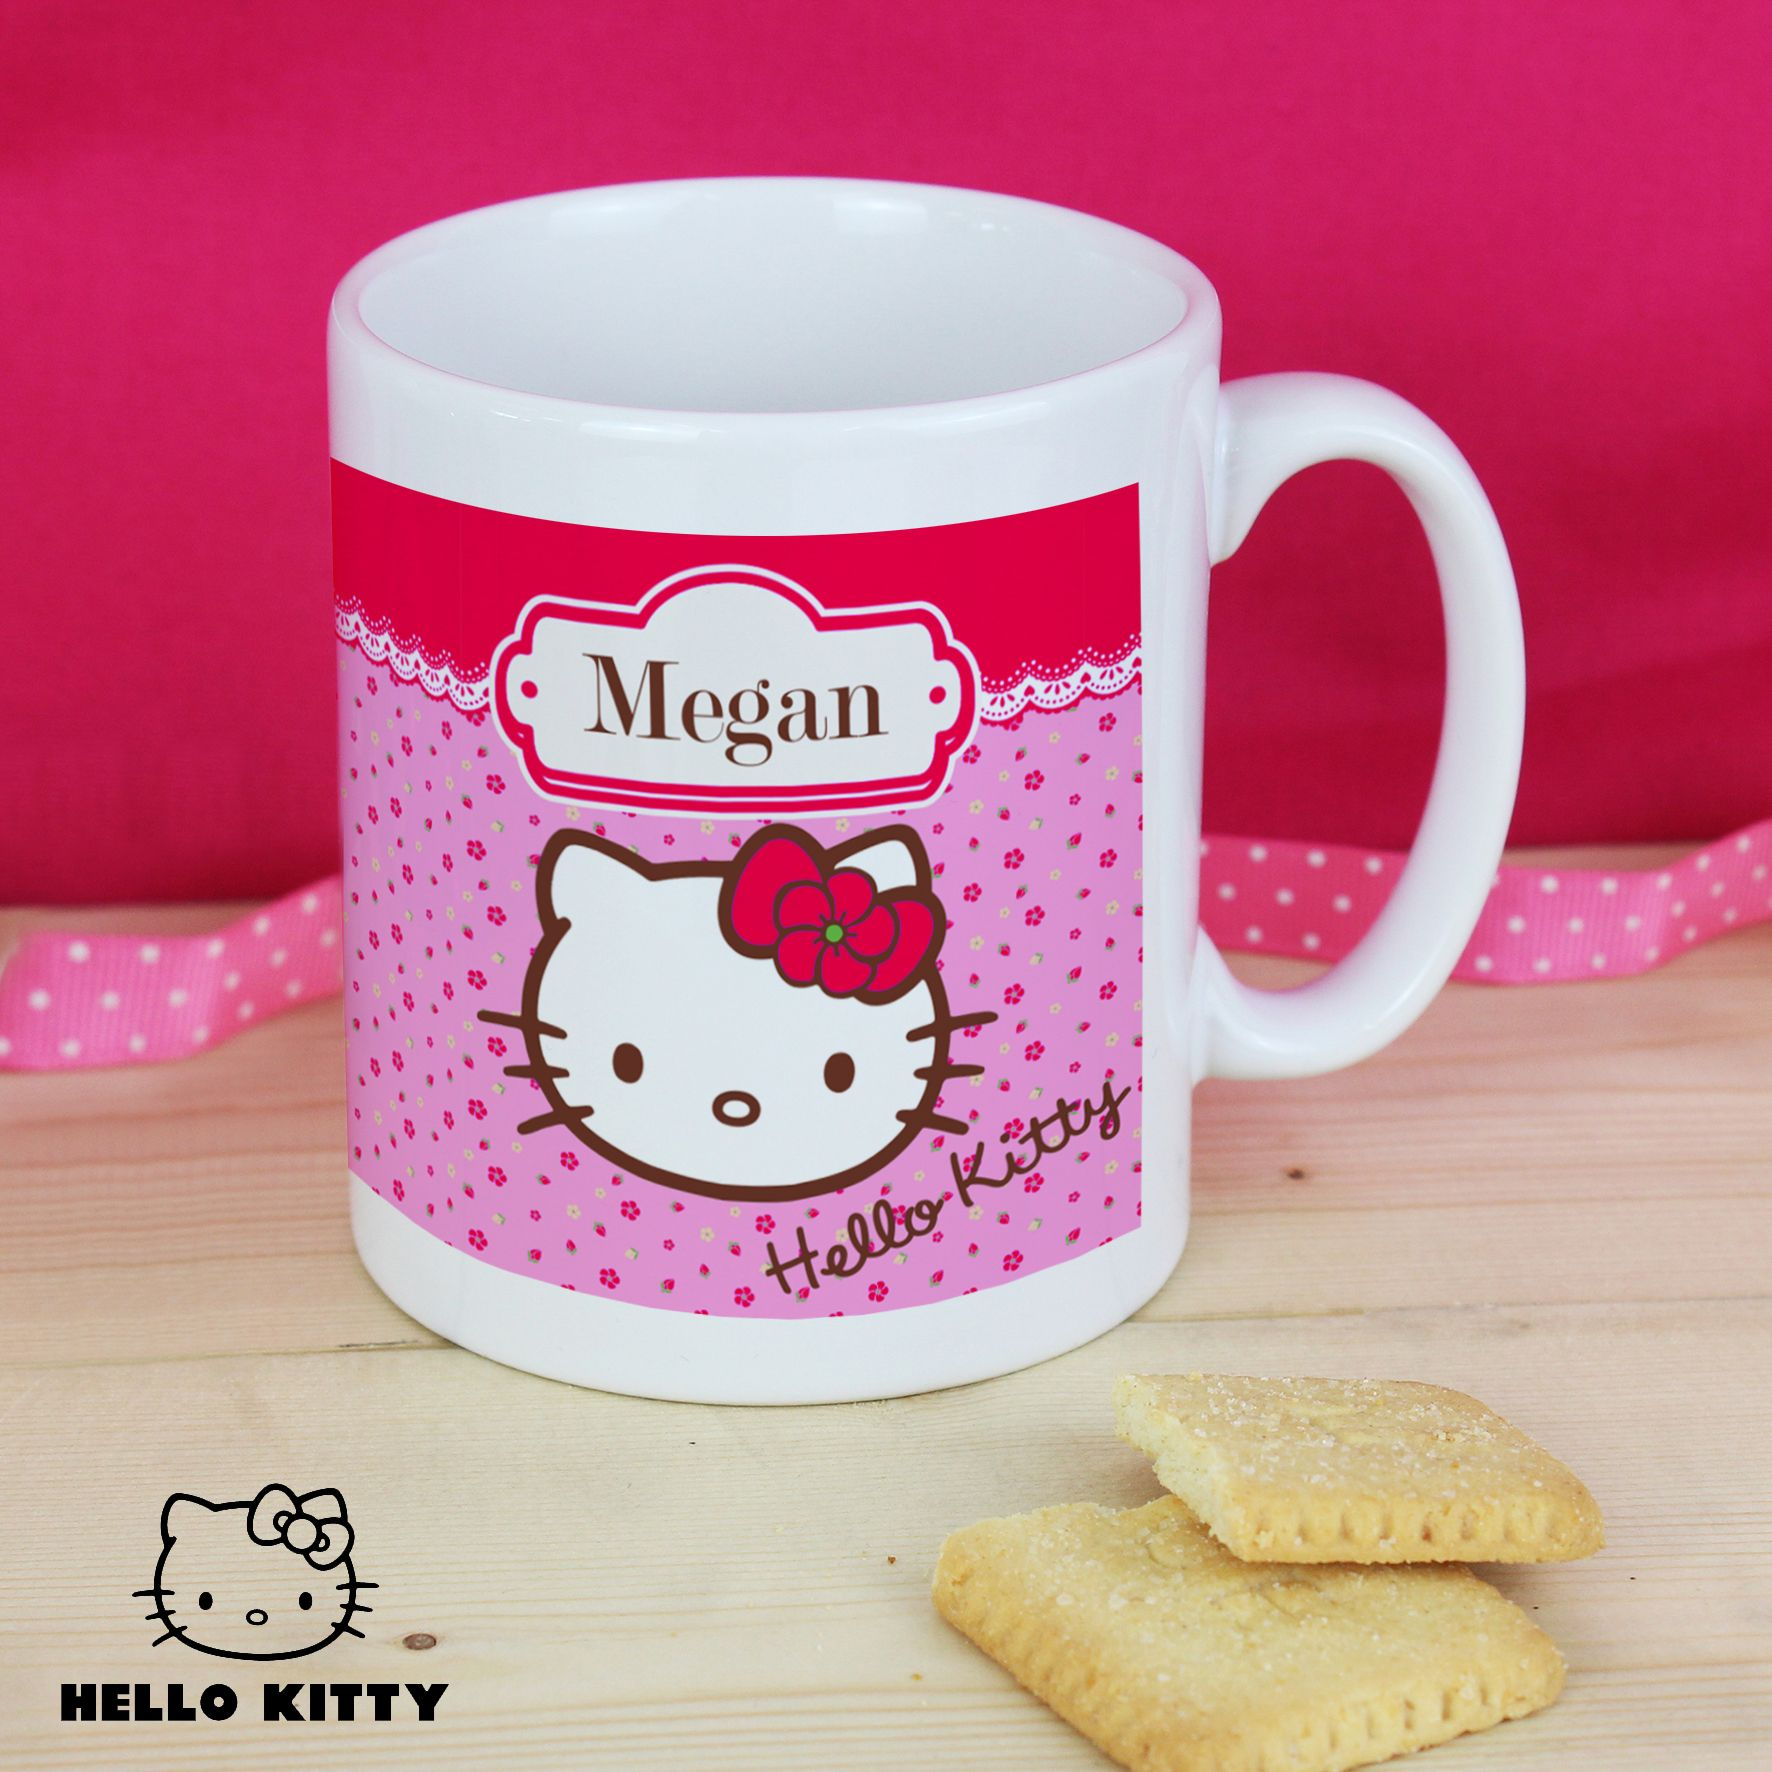 Hello kitty floral mug hello kitty gifts hello kitty